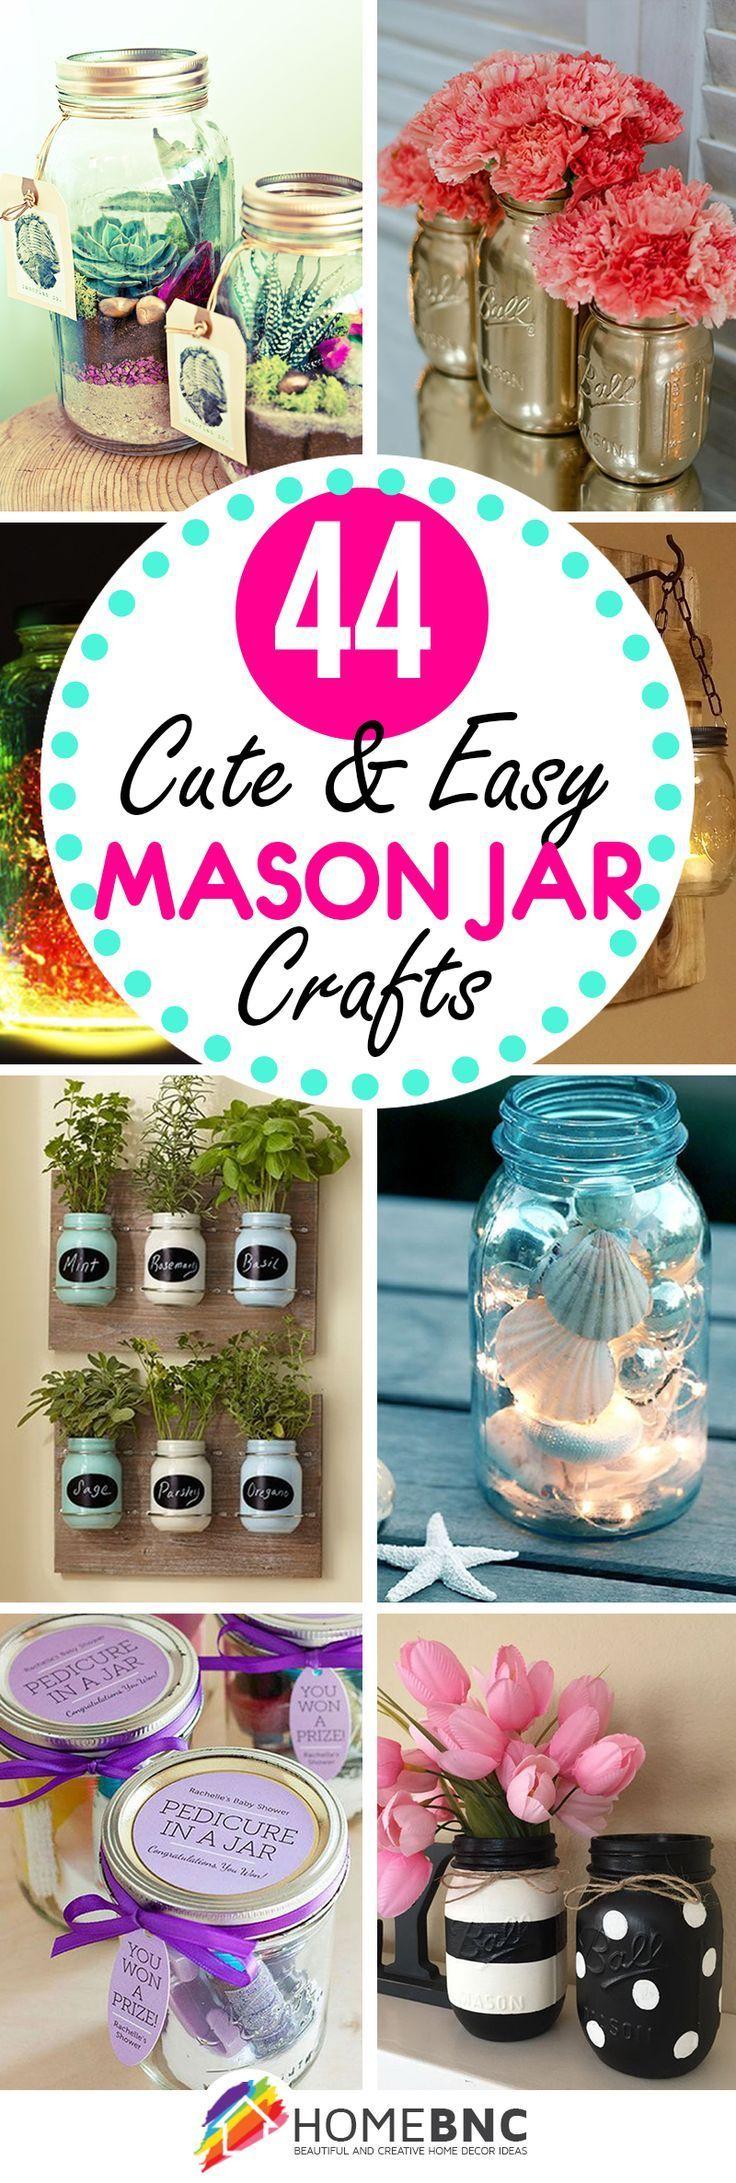 Get Creative With These 50 Diy Mason Jar Crafts Diy Jar Crafts Jar Crafts Mason Jar Crafts